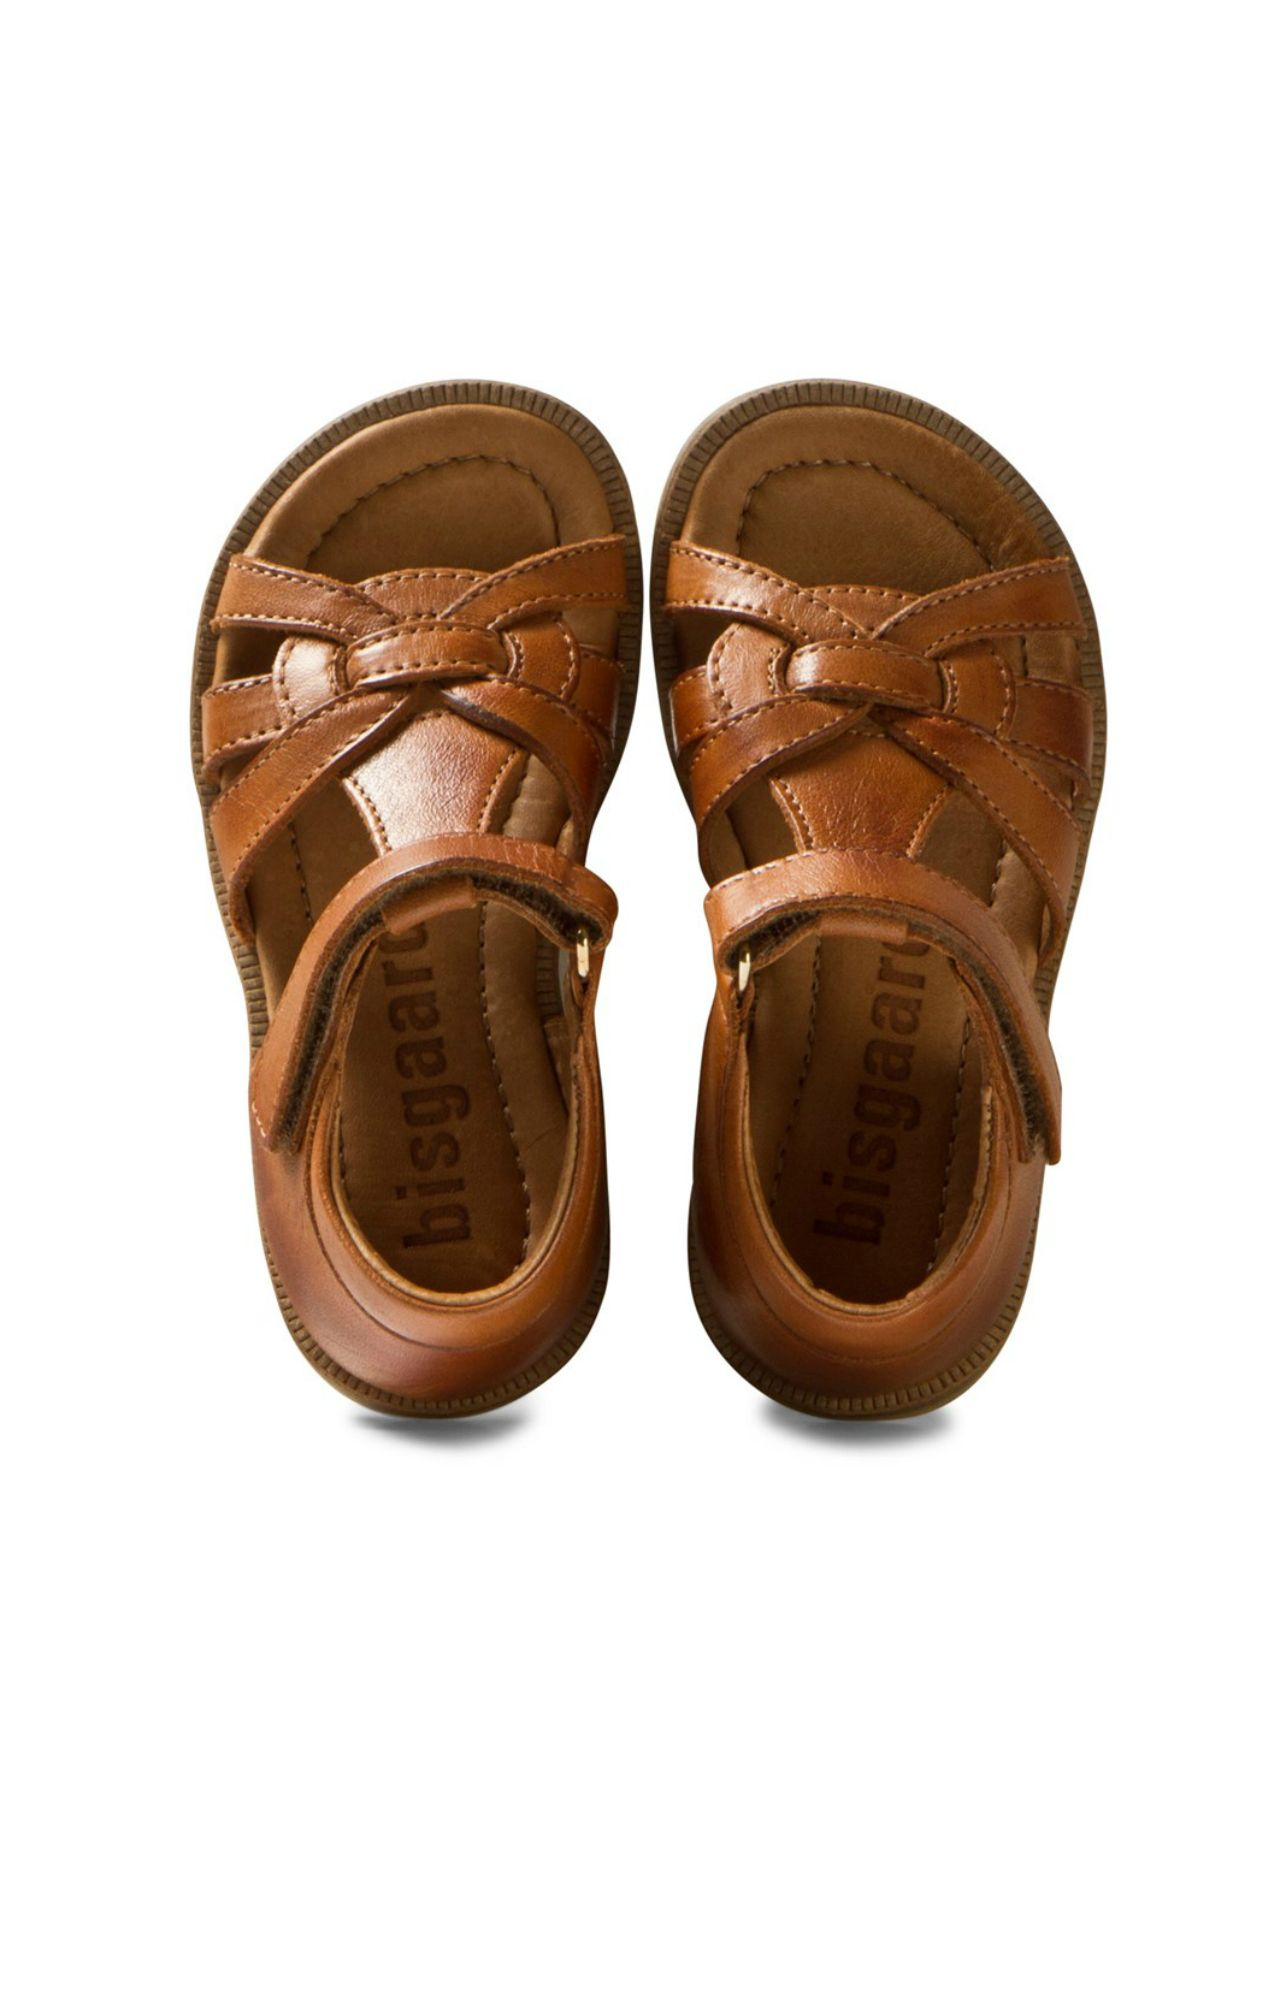 5595b6e3 Cognac Leather Sandals | Bisgaard | Fashion for Kids | Kids sandals ...